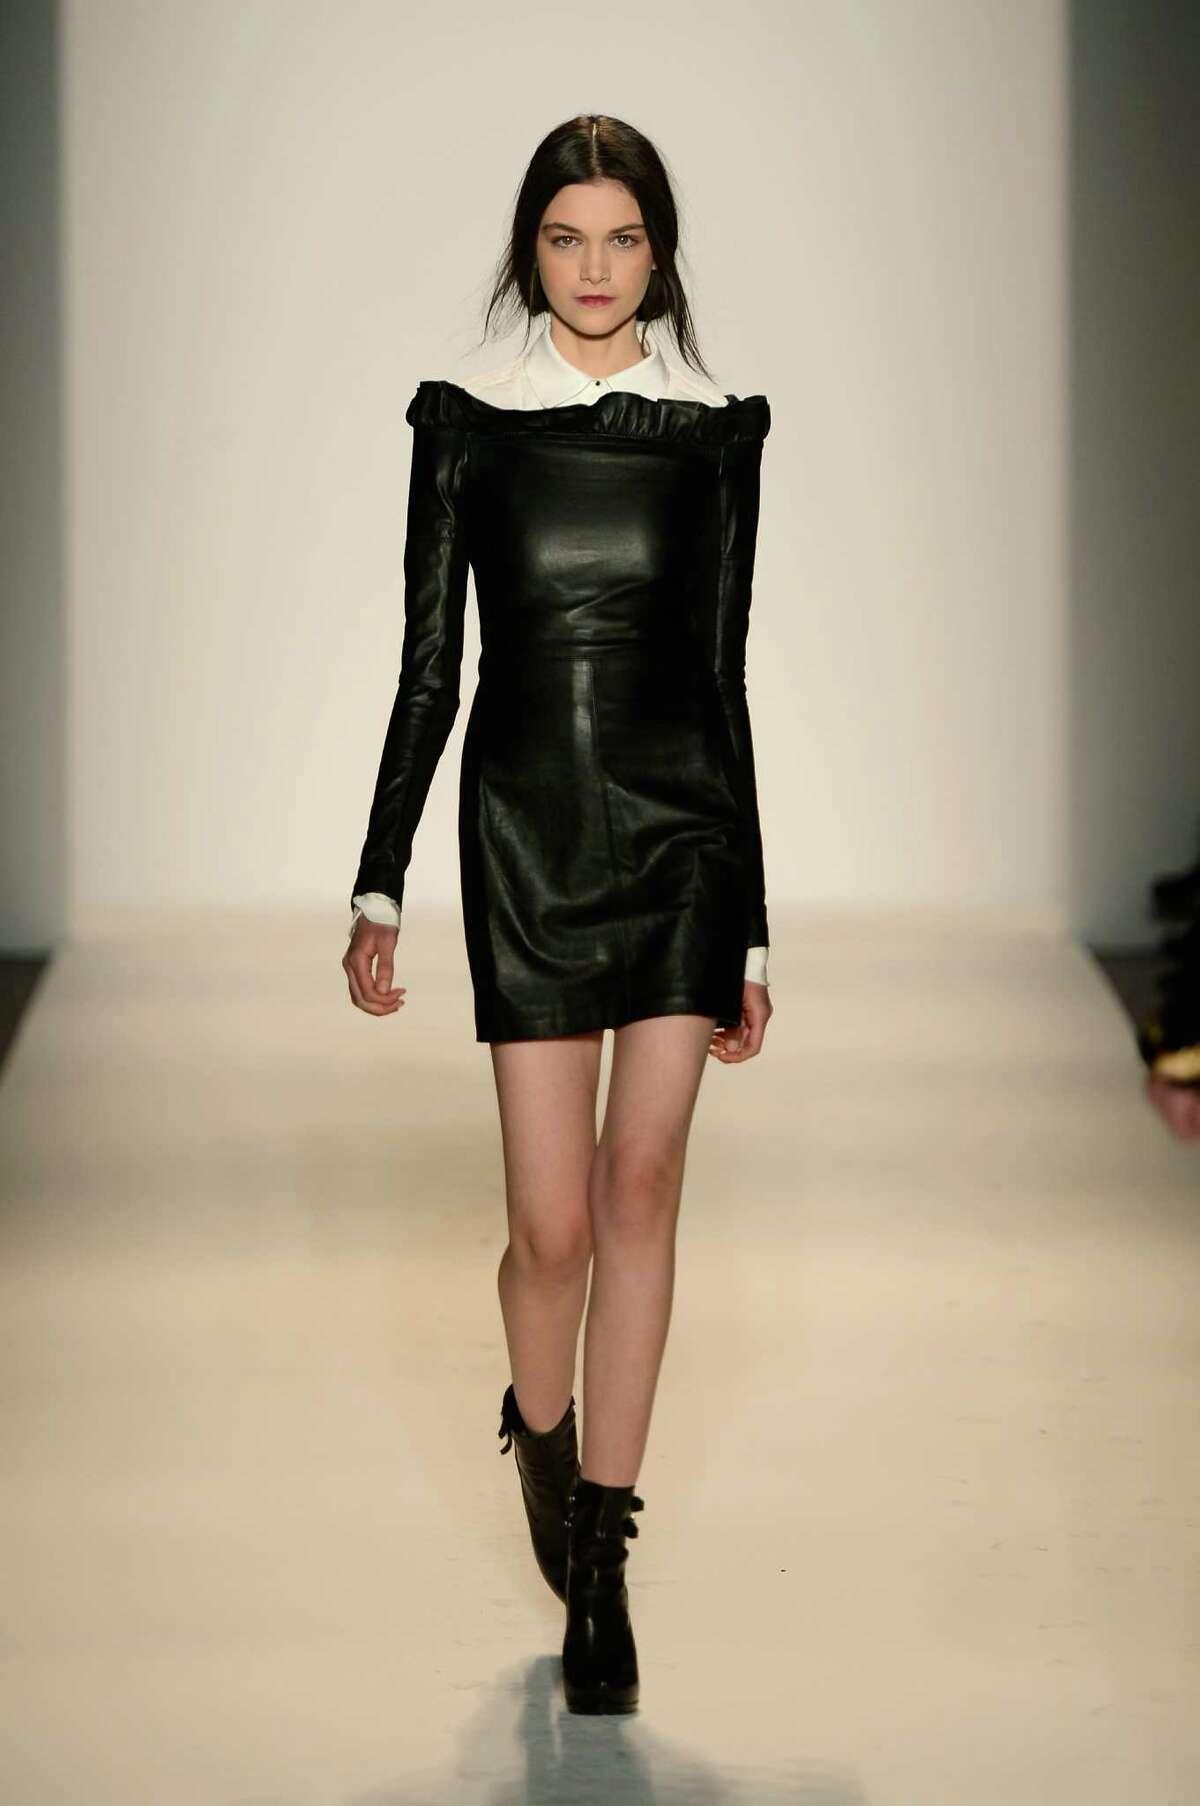 A model walks the runway at the Rachel Zoe Spring 2013